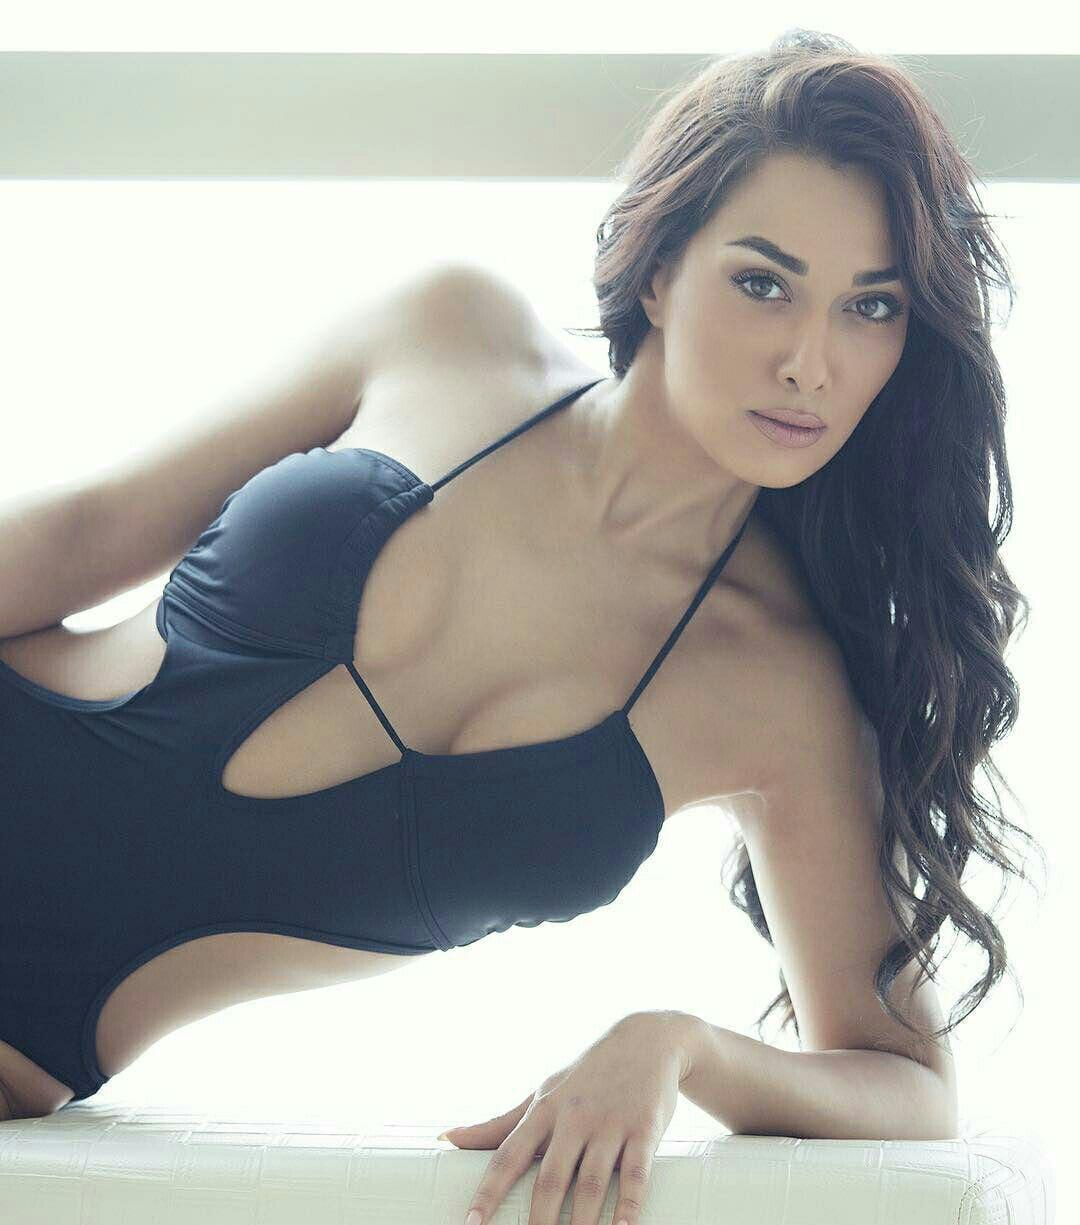 claudia lynx hot sexy ass